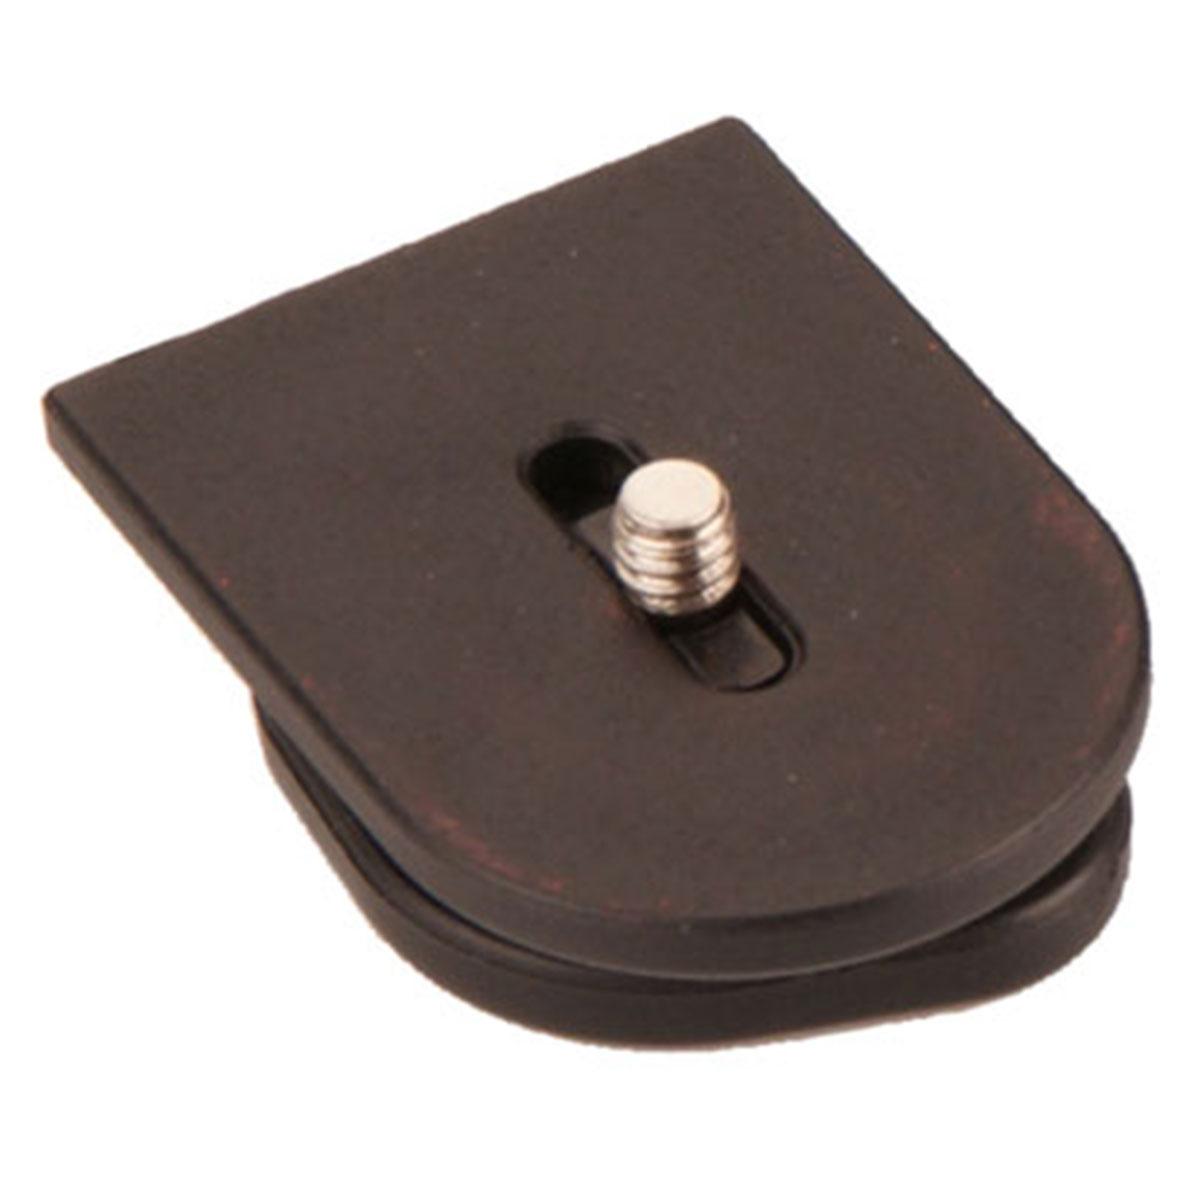 B.I.G. Kameraplatte für Gürtelhalter